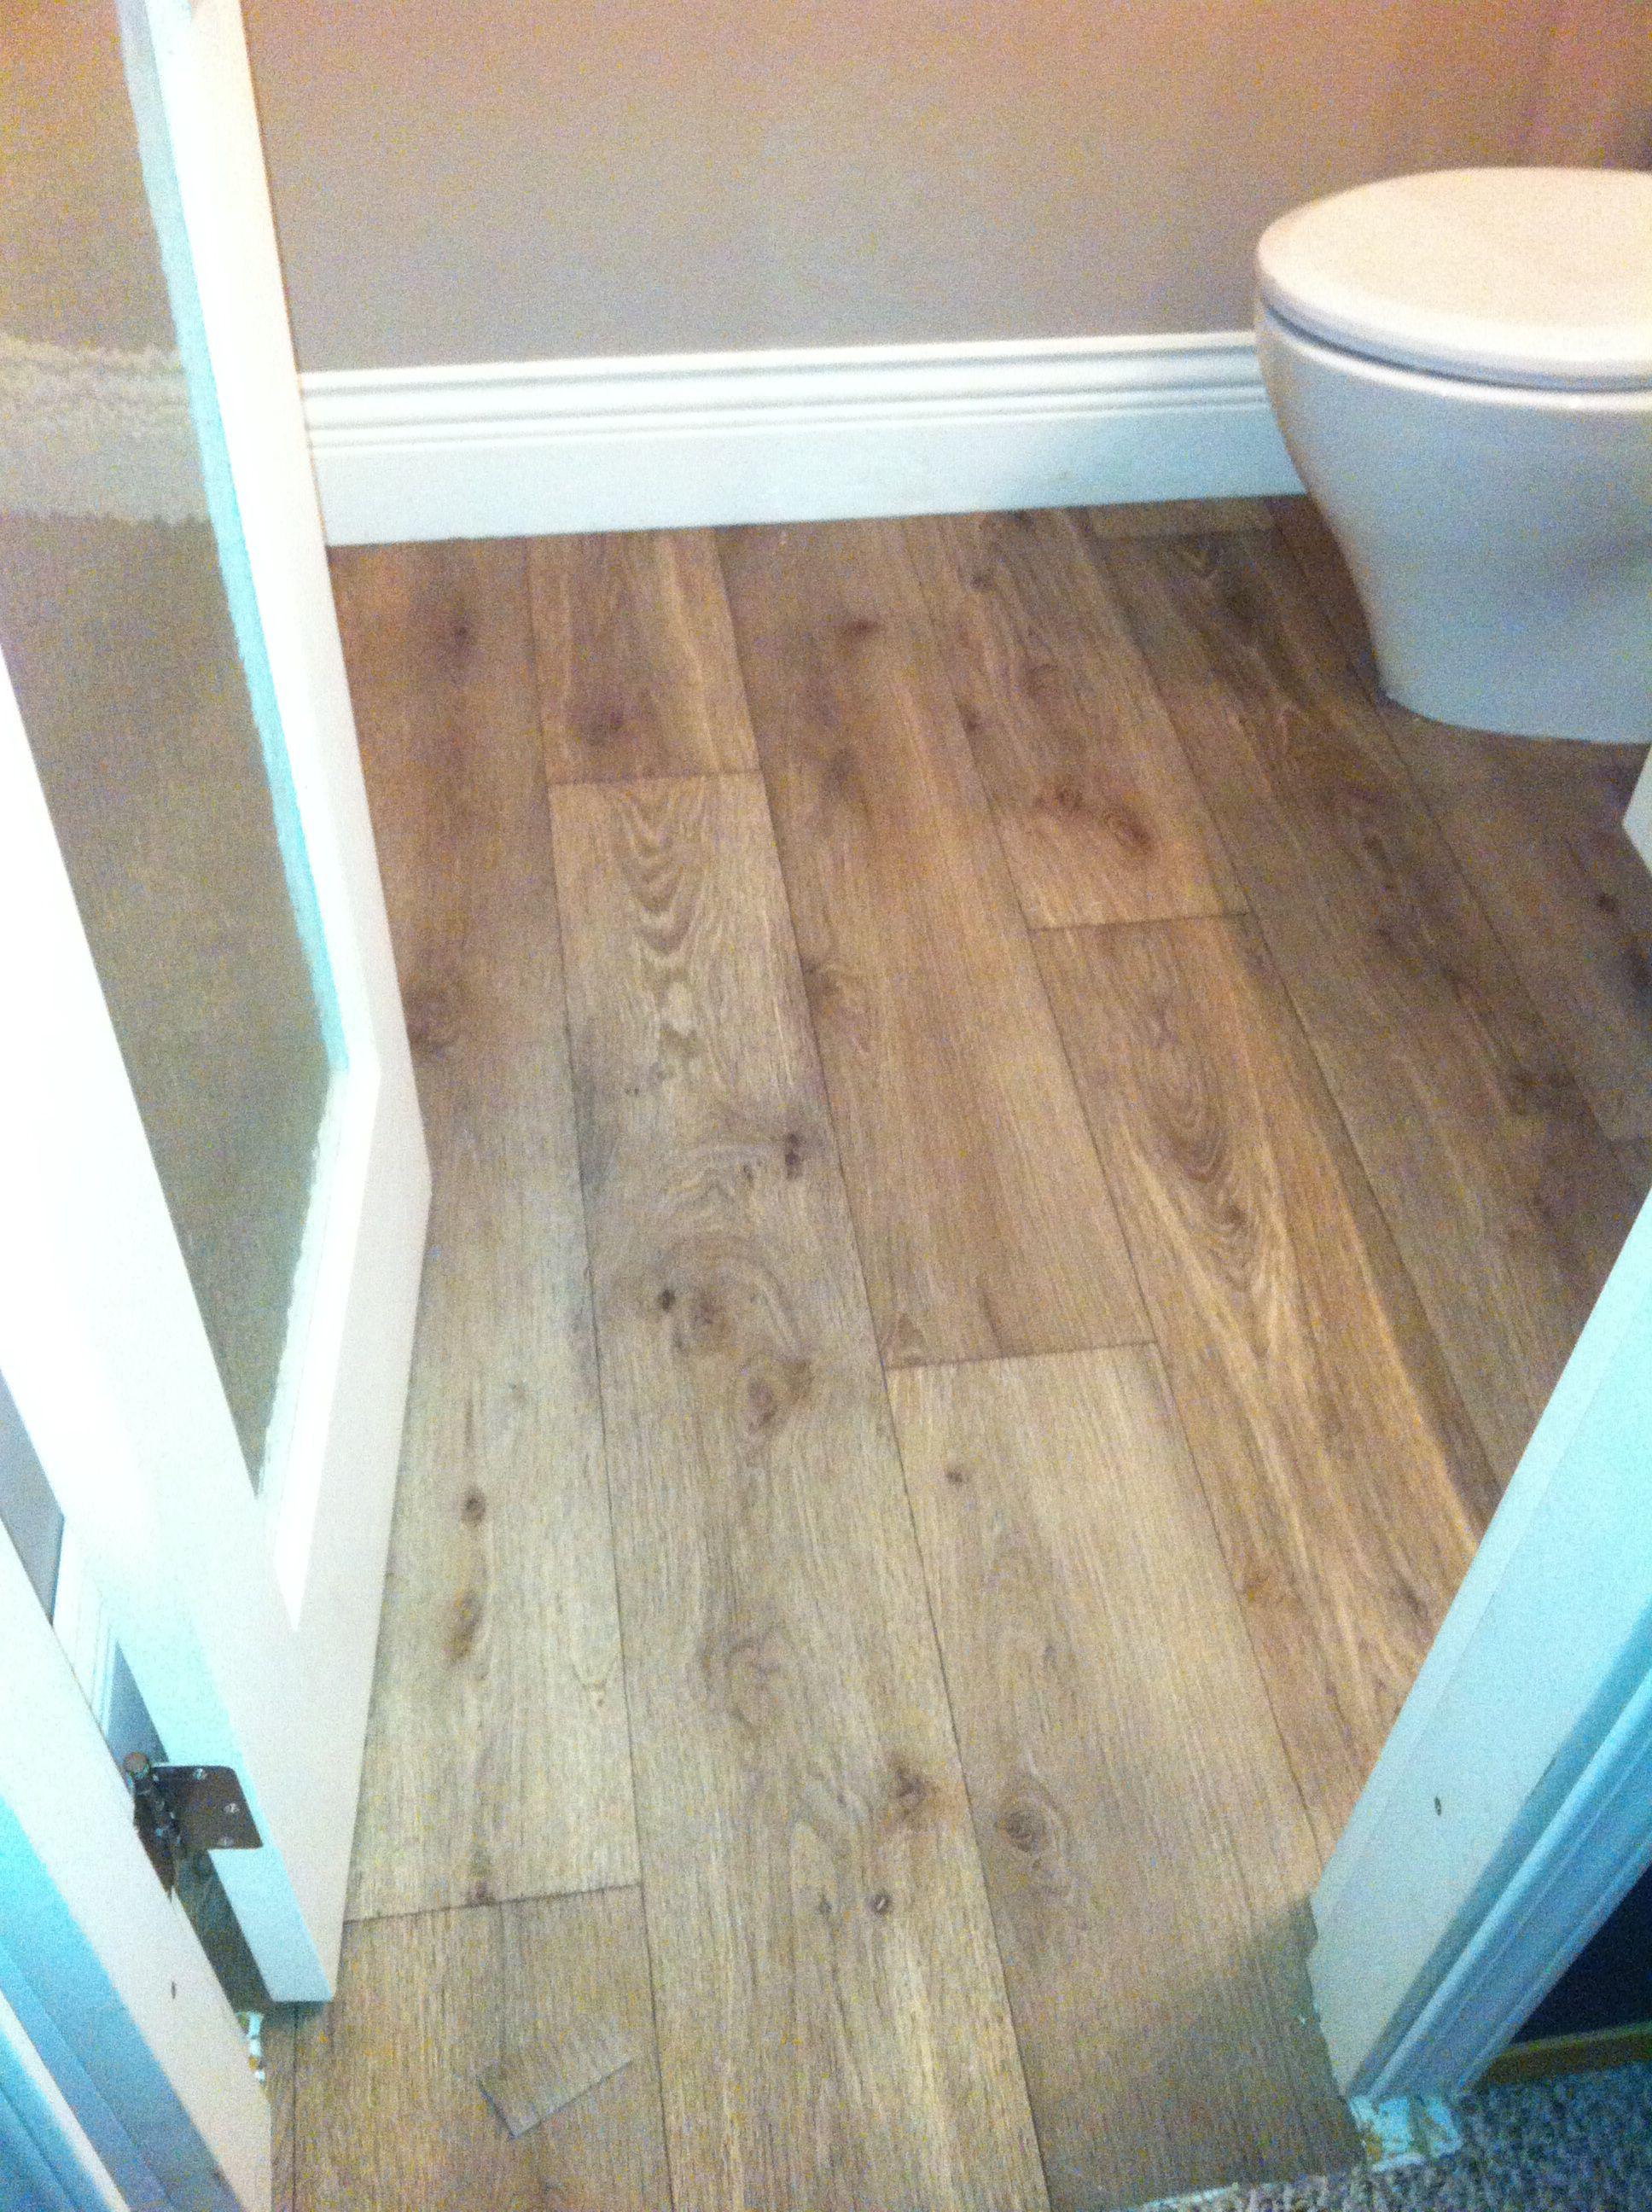 Vinyl Barnwood Floors Vinyl Plank Flooring Barnwood Floors Vinyl Plank Flooring Bathroom